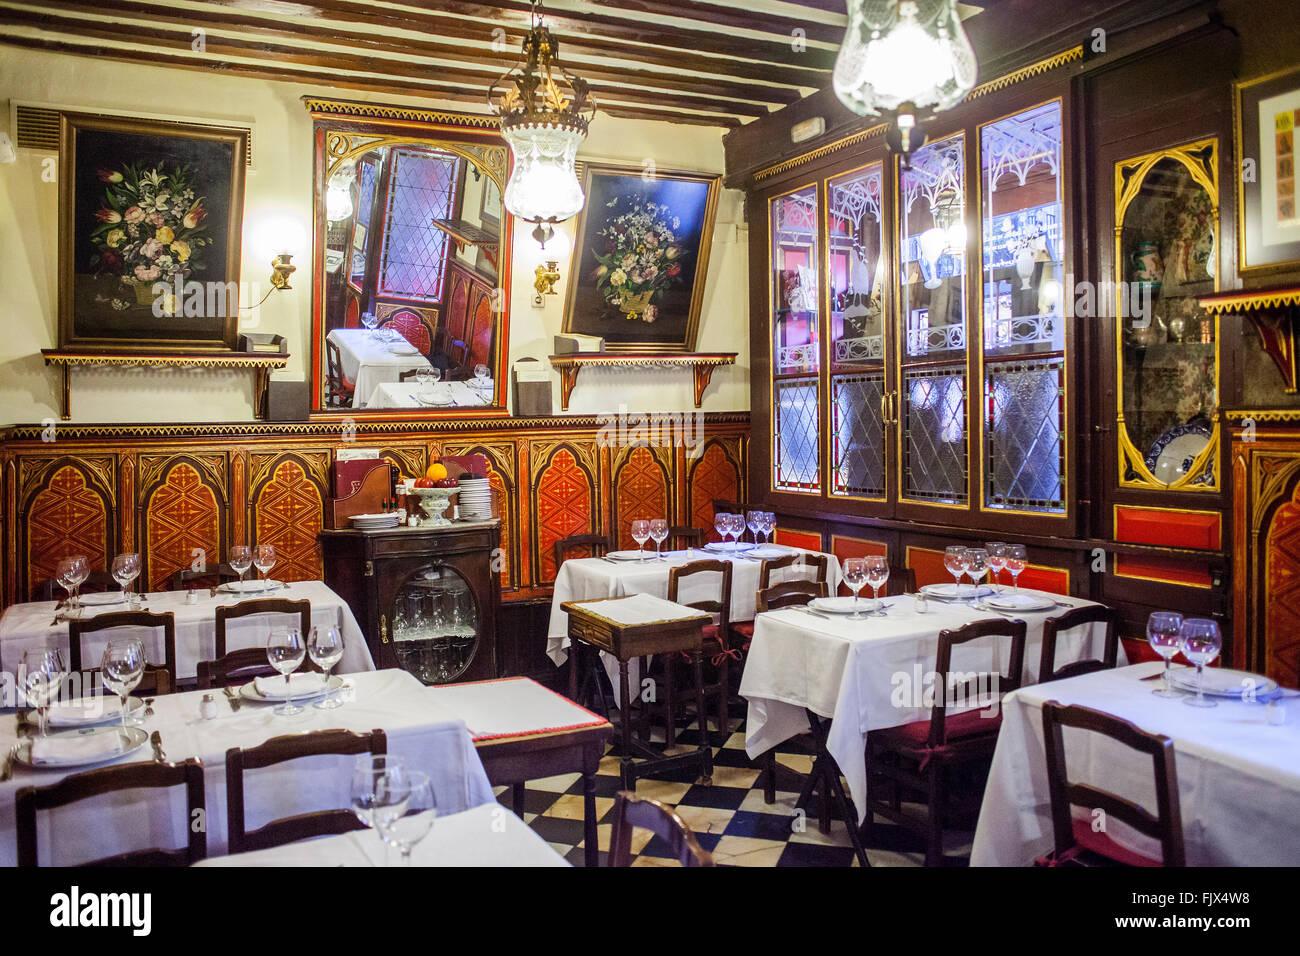 Sobrino de botin restaurant calle cuchilleros 17 madrid for Casa botin madrid